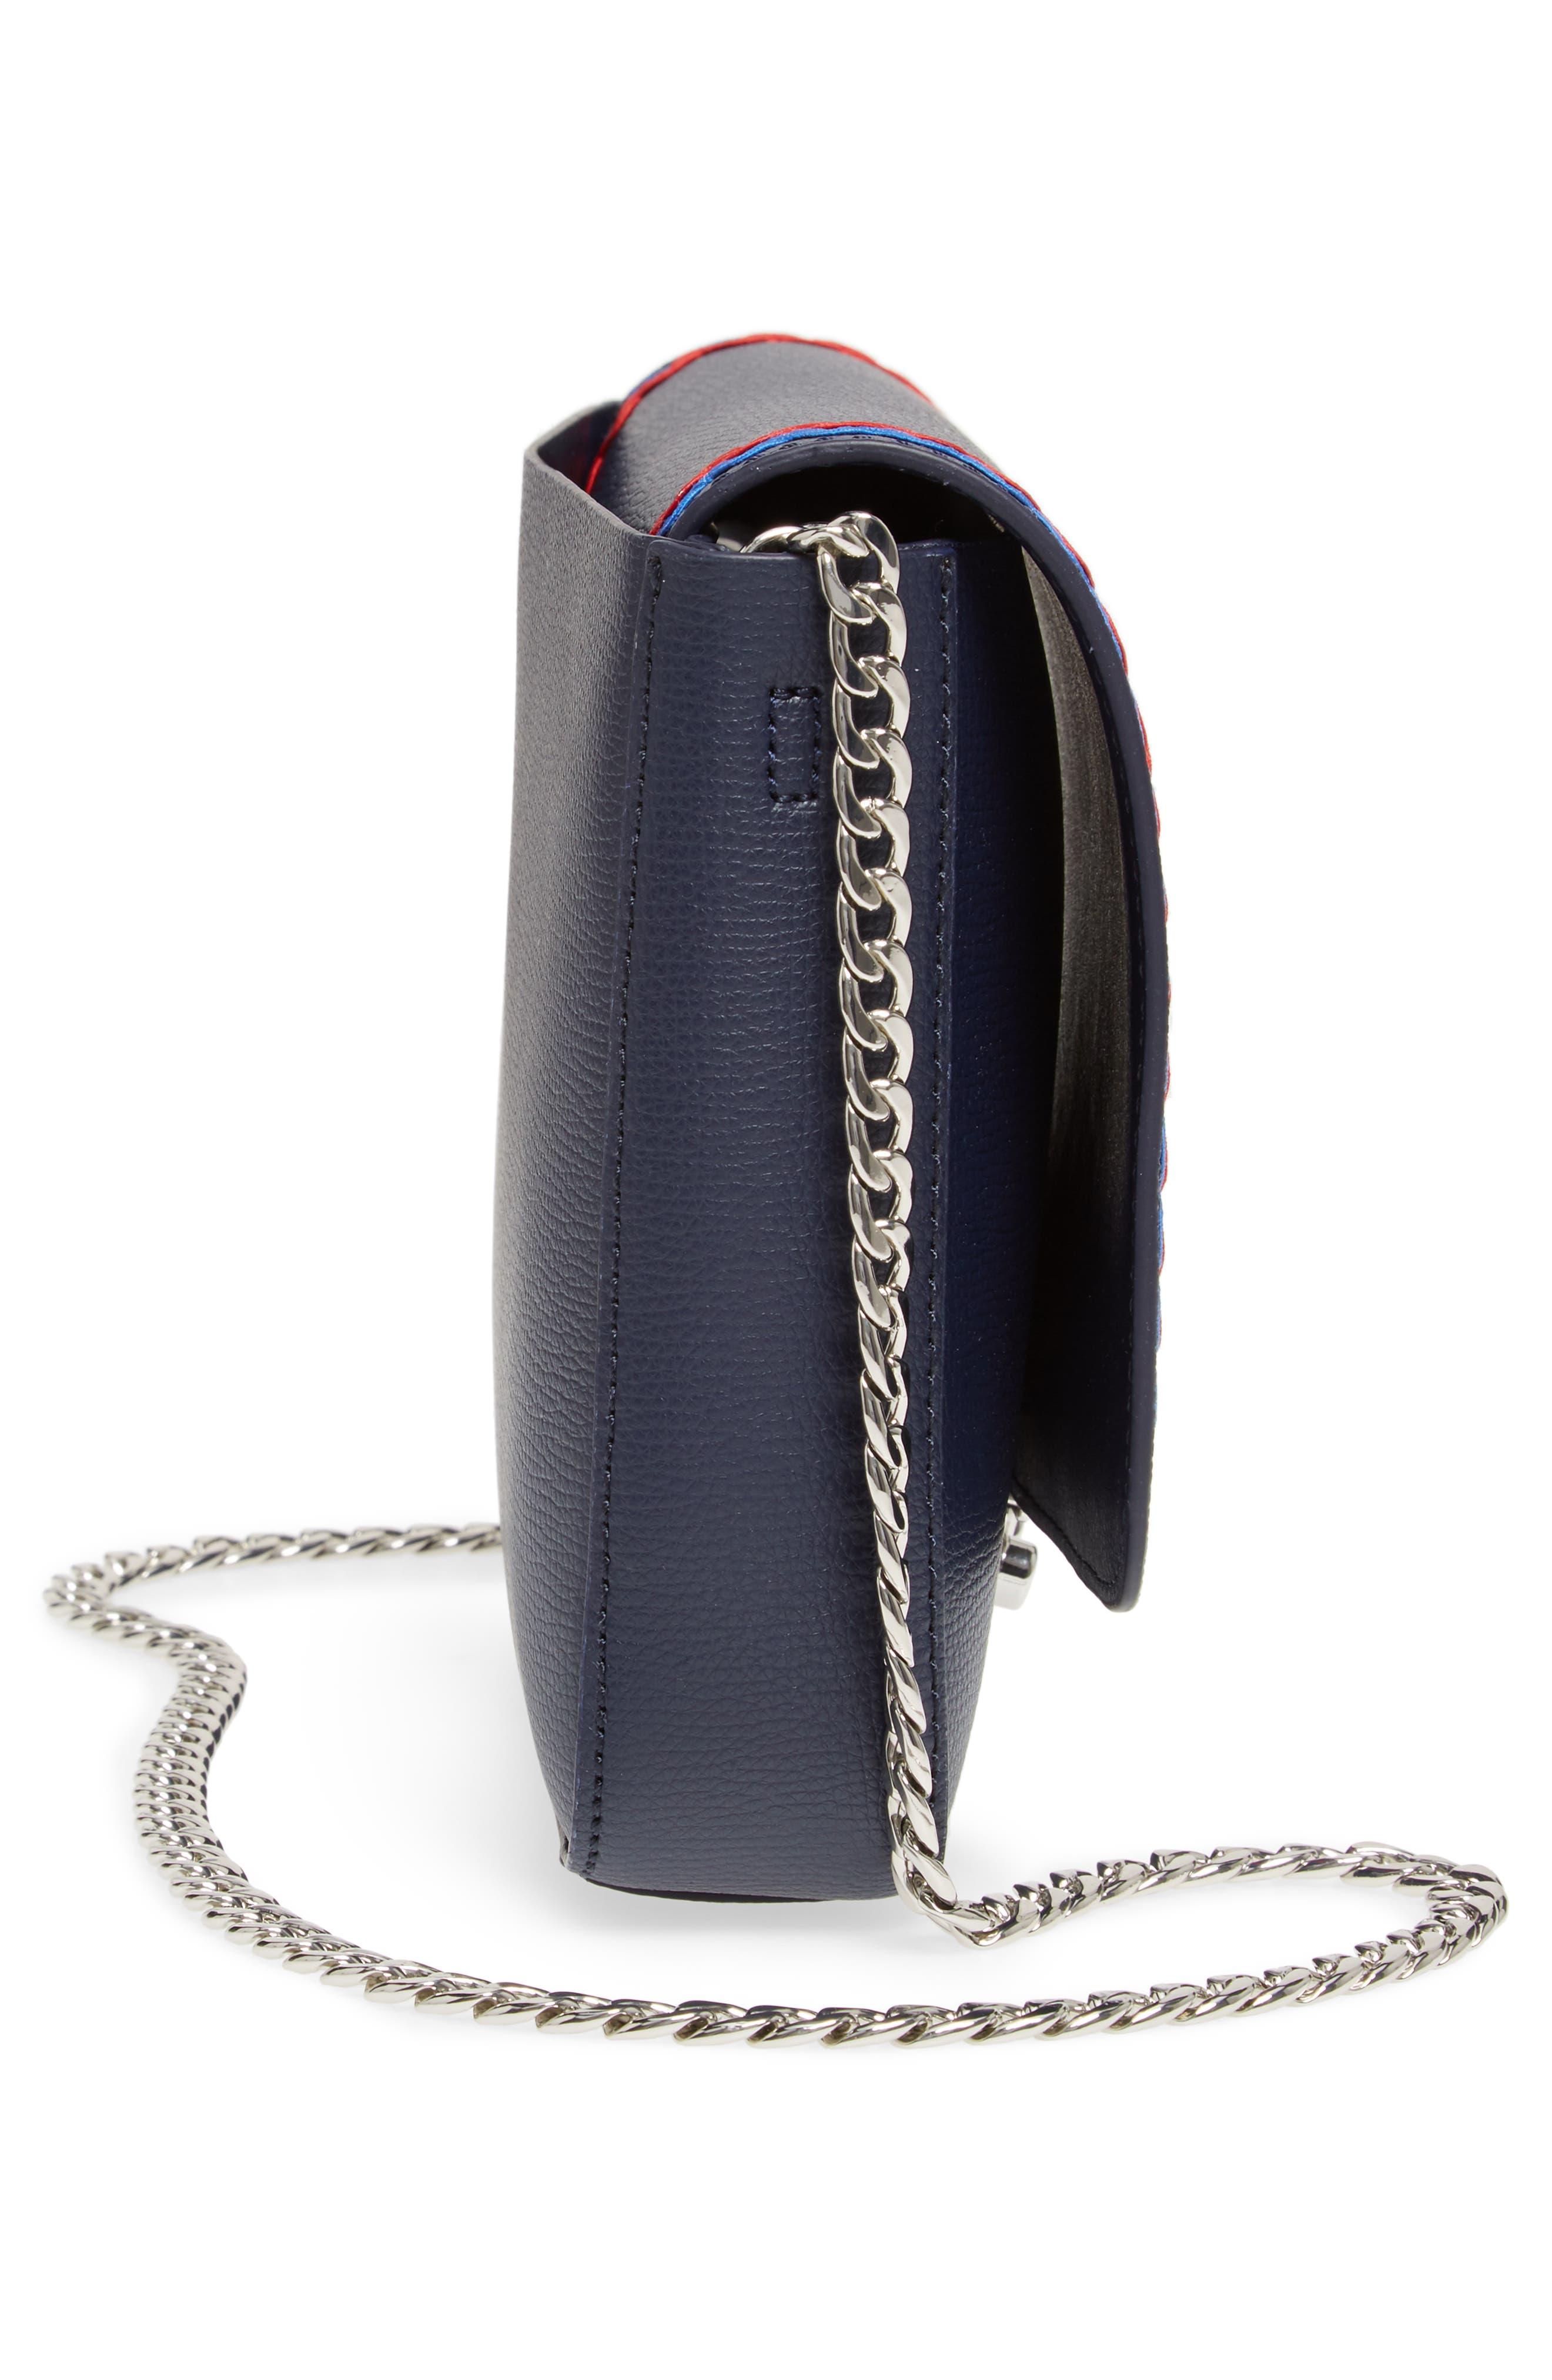 Lock Leather Flap Clutch/Shoulder Bag,                             Alternate thumbnail 5, color,